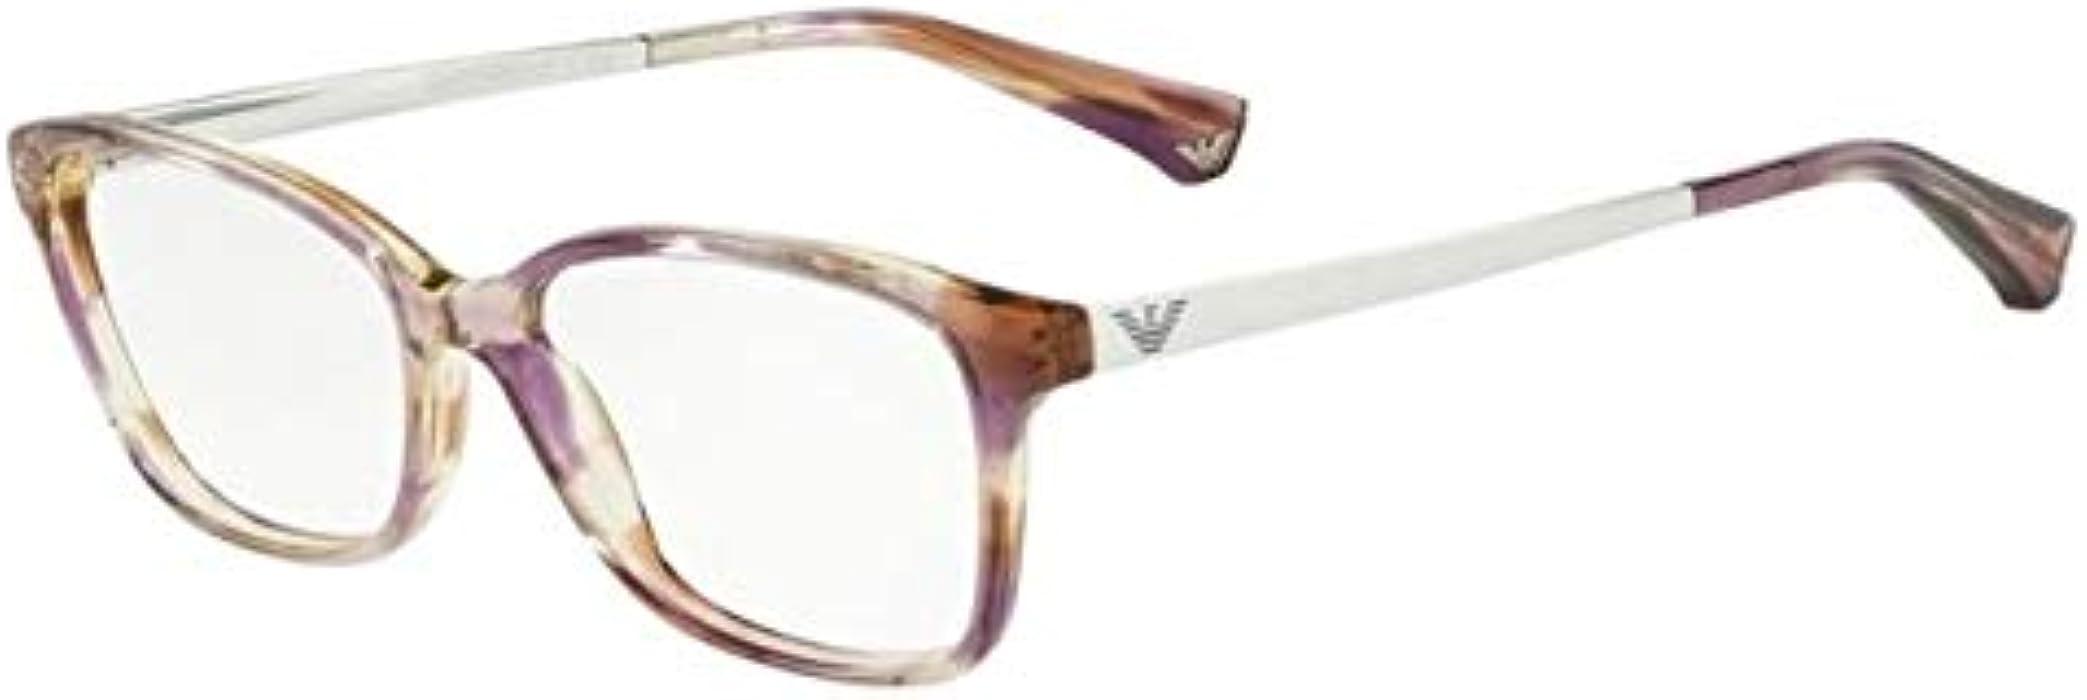 f4e10e2f72 Ray-Ban Women s 0EA3026 Optical Frames Multicolour (Water Color Plum ...